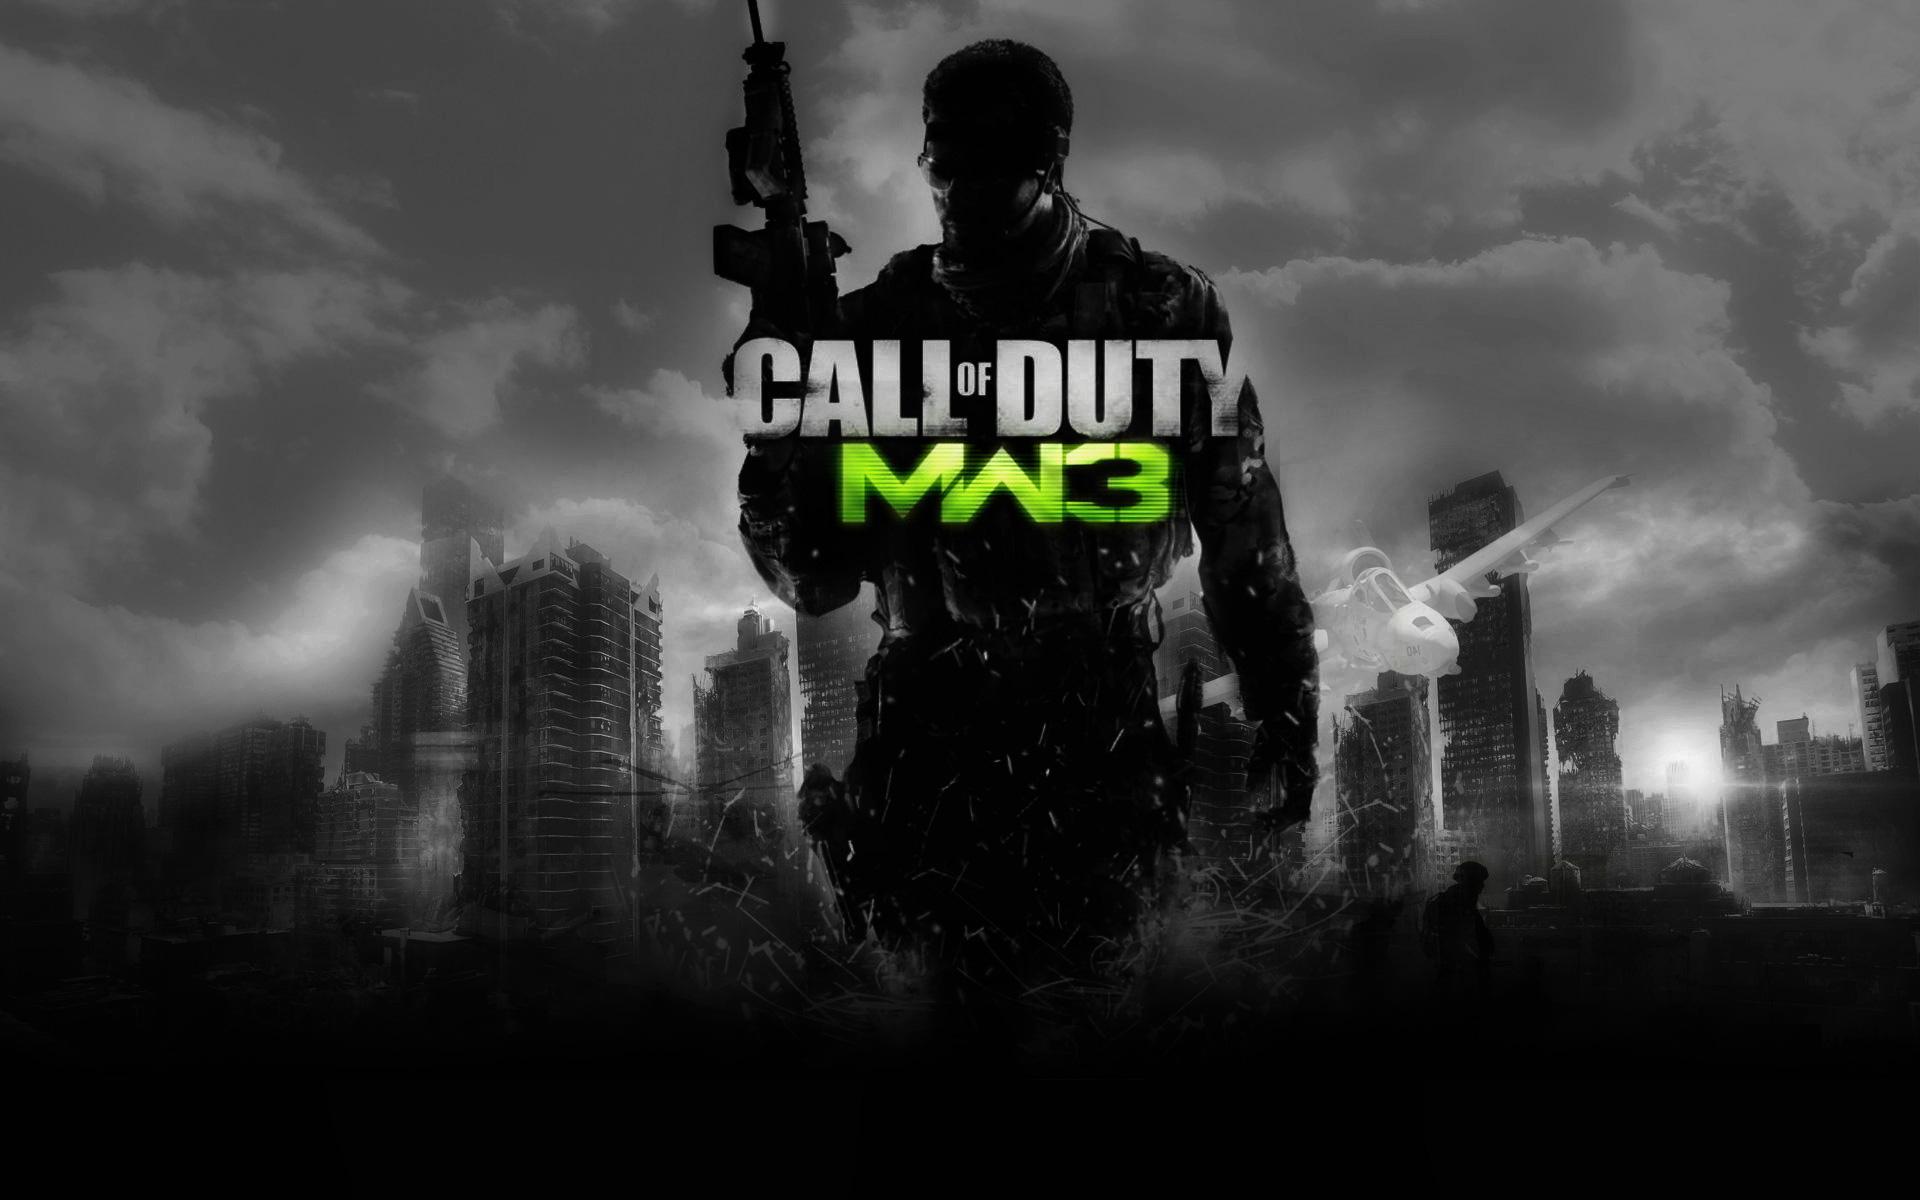 call of duty modern warfare 3 pc | WORLD OF GAMES